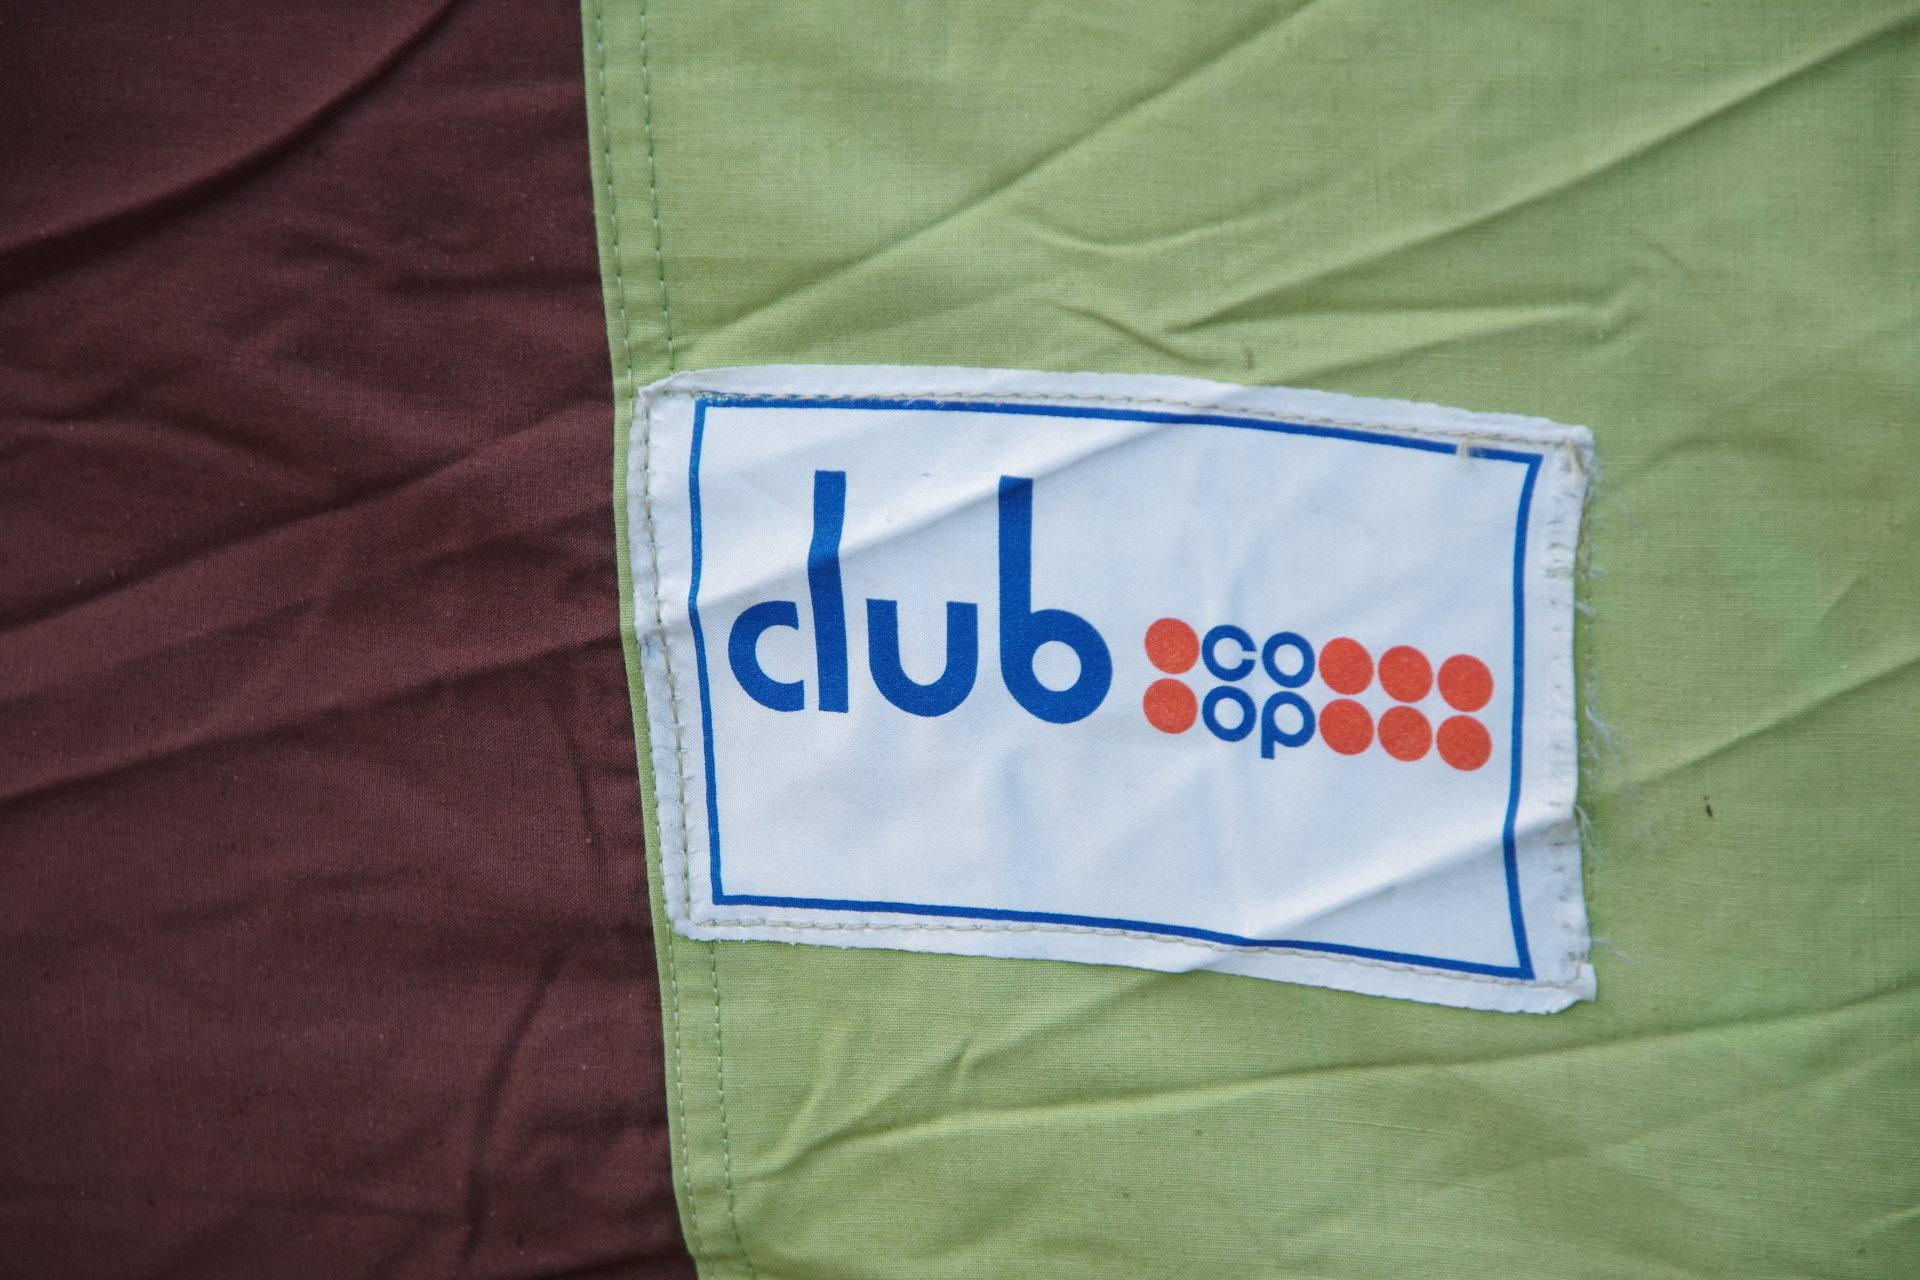 CluBcoop メッサージュ ロッジテント 6人用 家族用 アースカラー ヴィンテージ幕 フレームテント Message